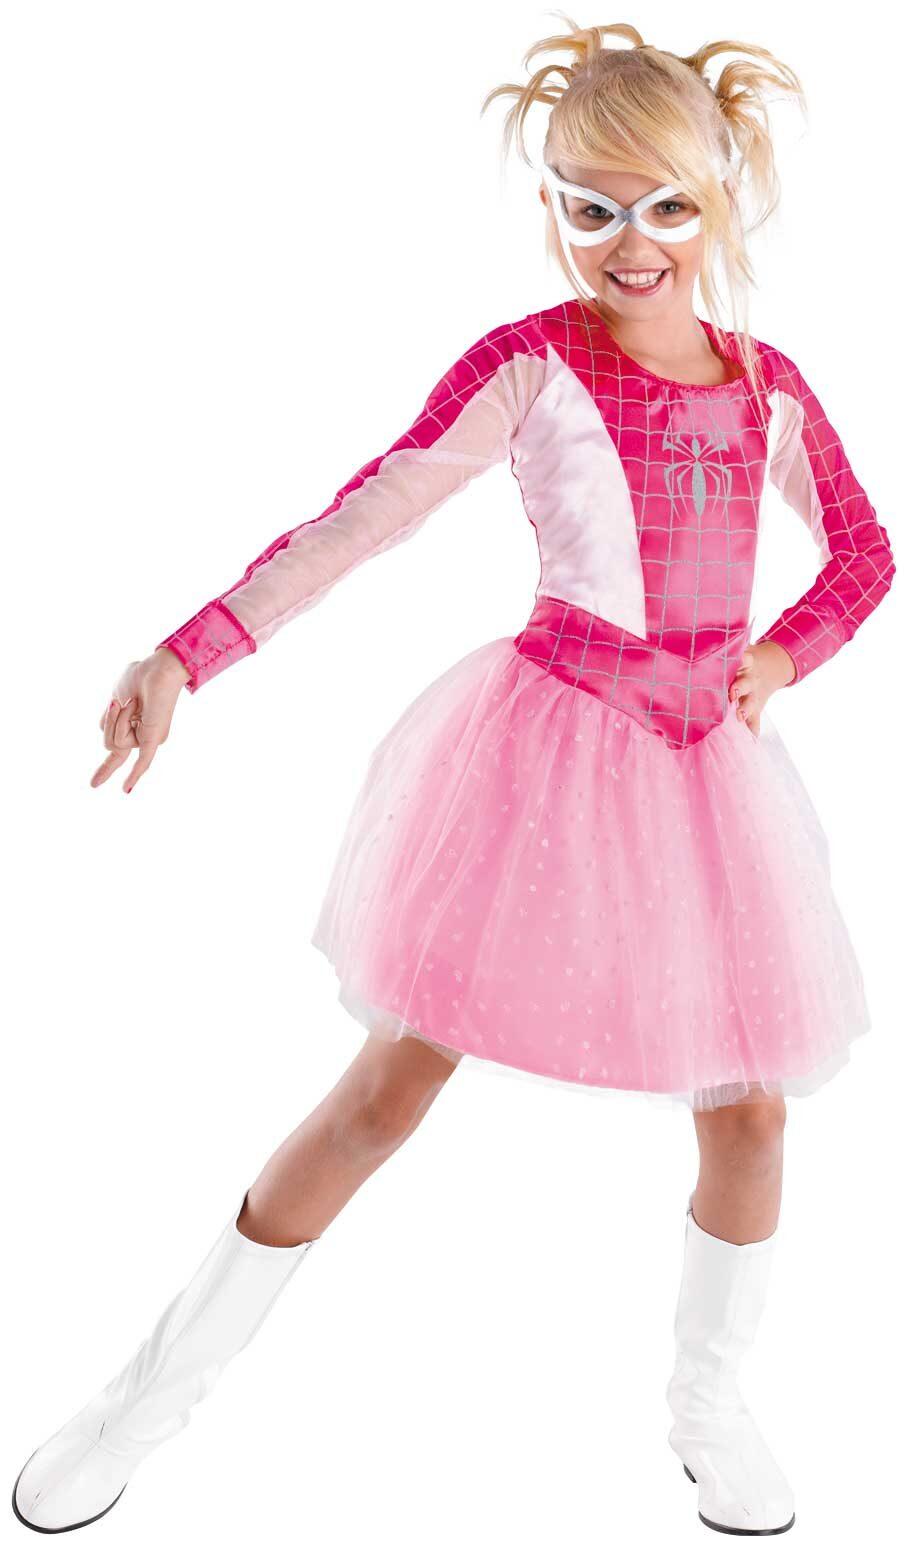 Pink Spider Girl Superhero Kids Costume Mr Costumes  sc 1 st  Meningrey & Toddler Girl Superhero Costume - Meningrey